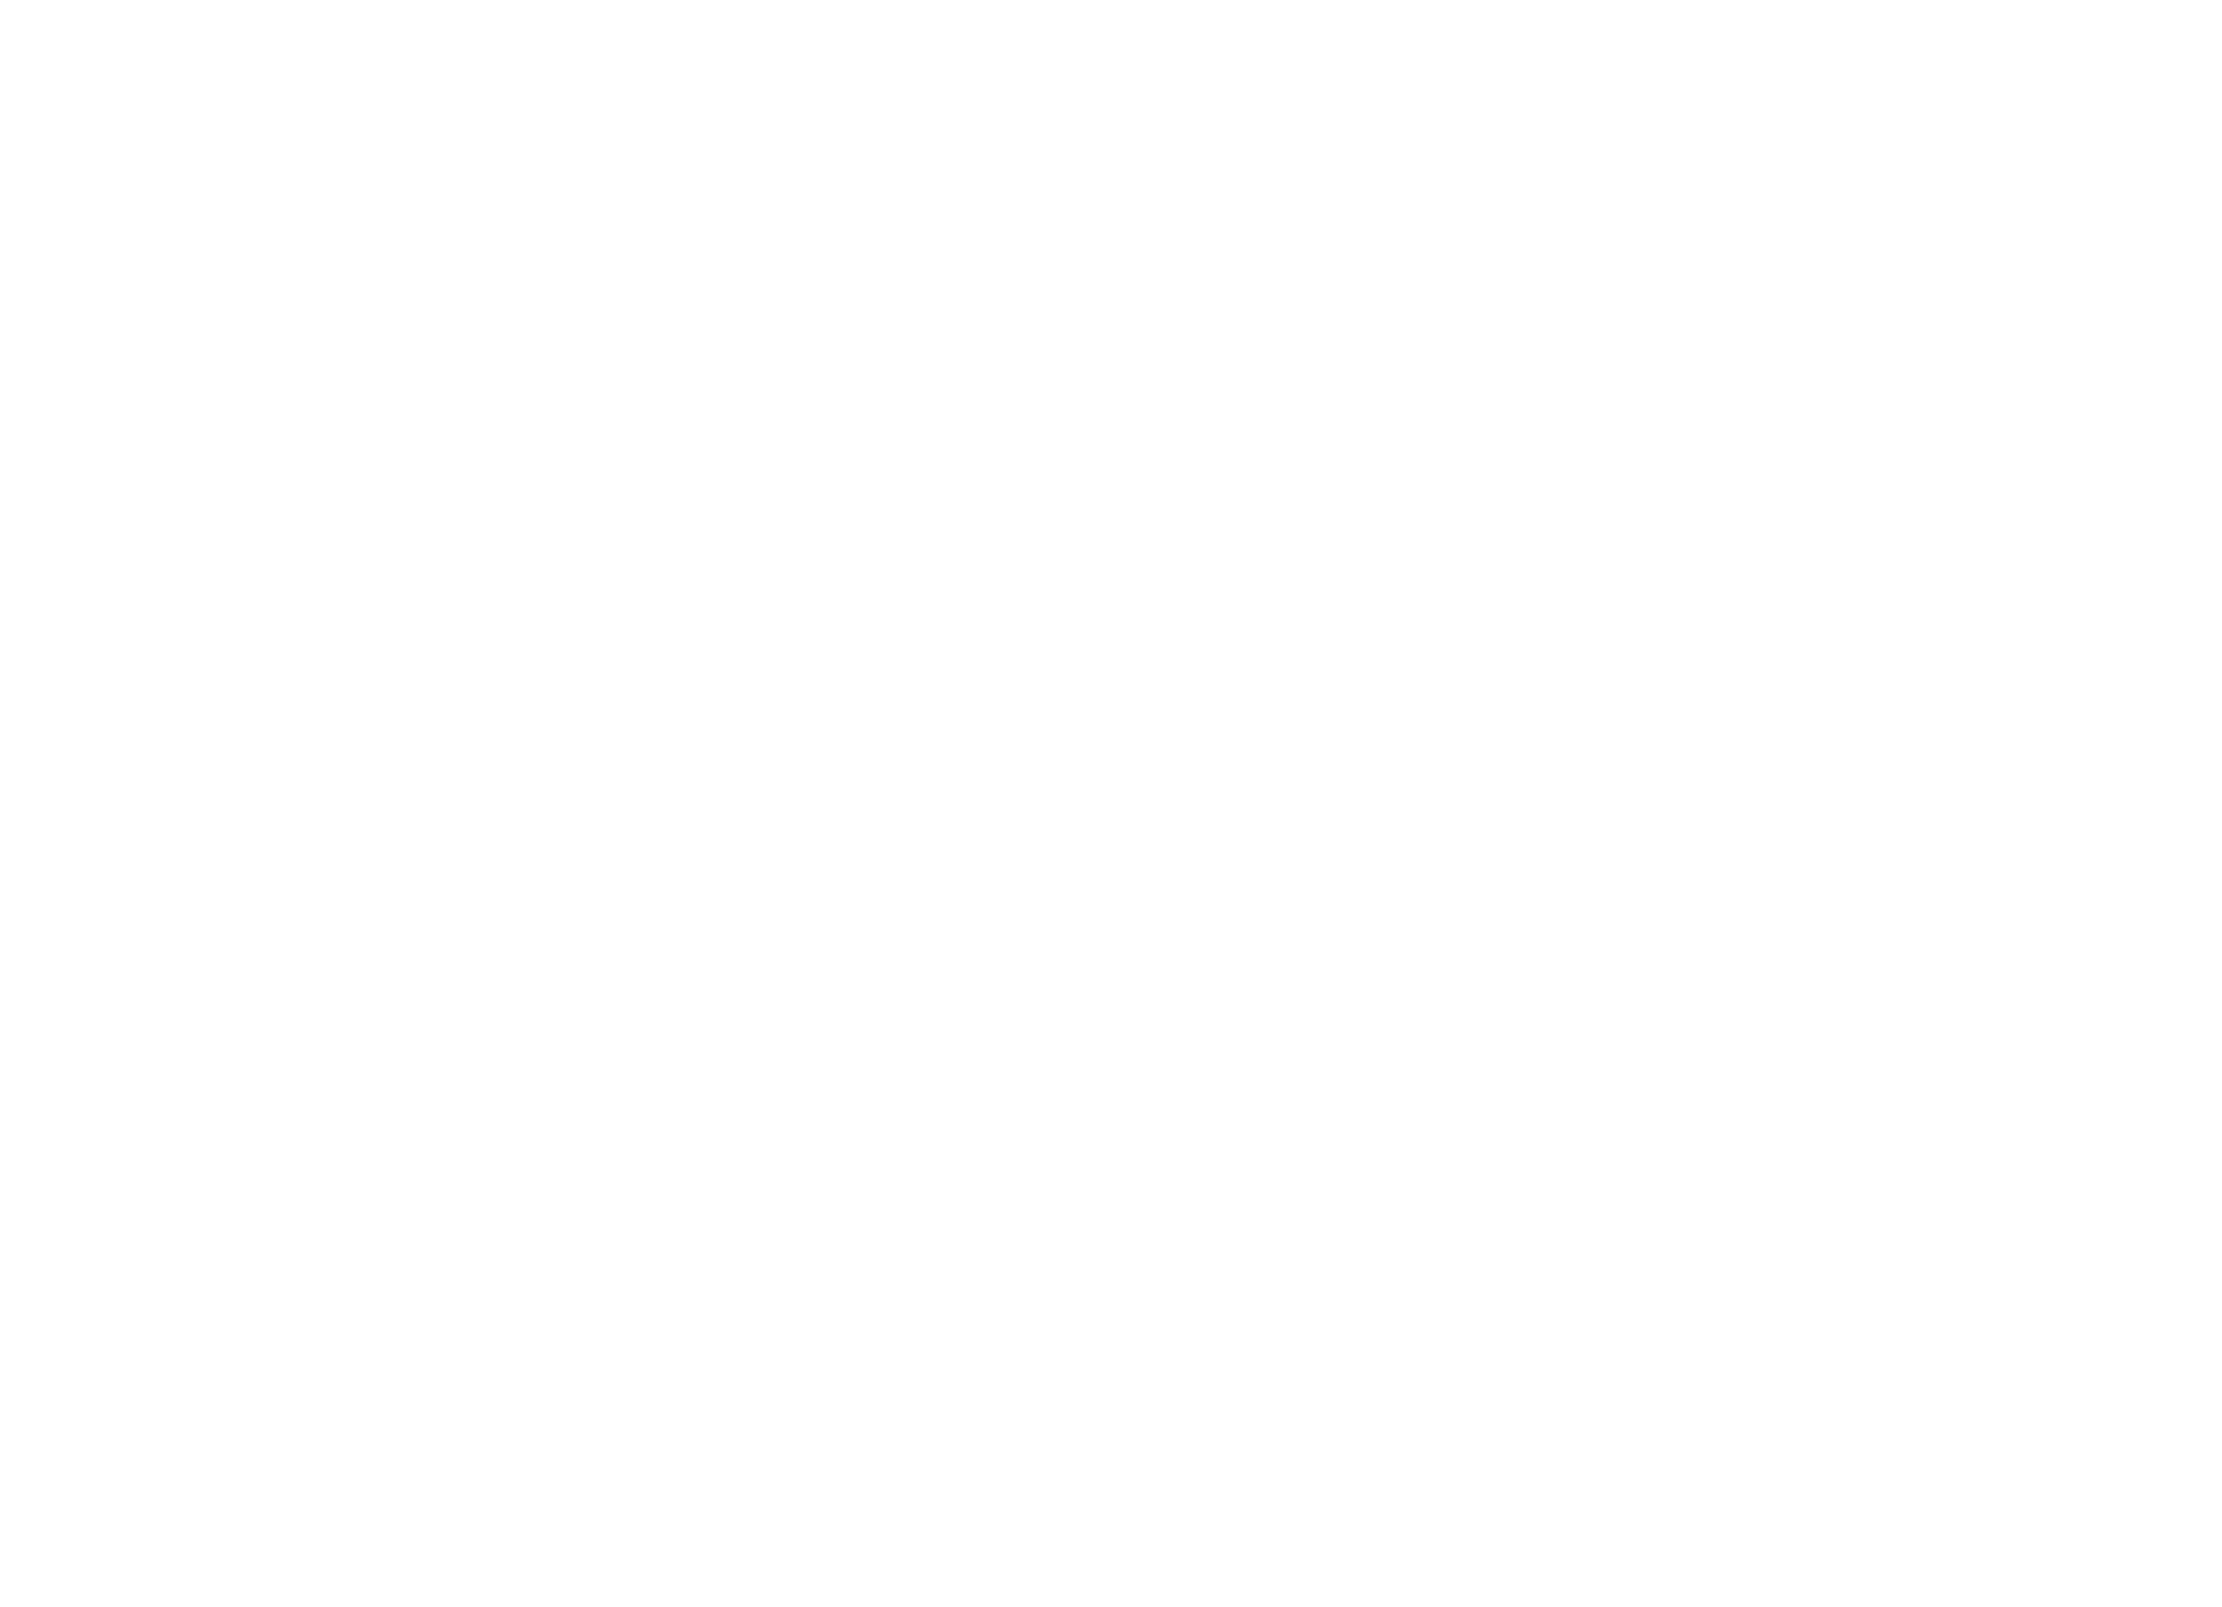 durham boutique logo durham